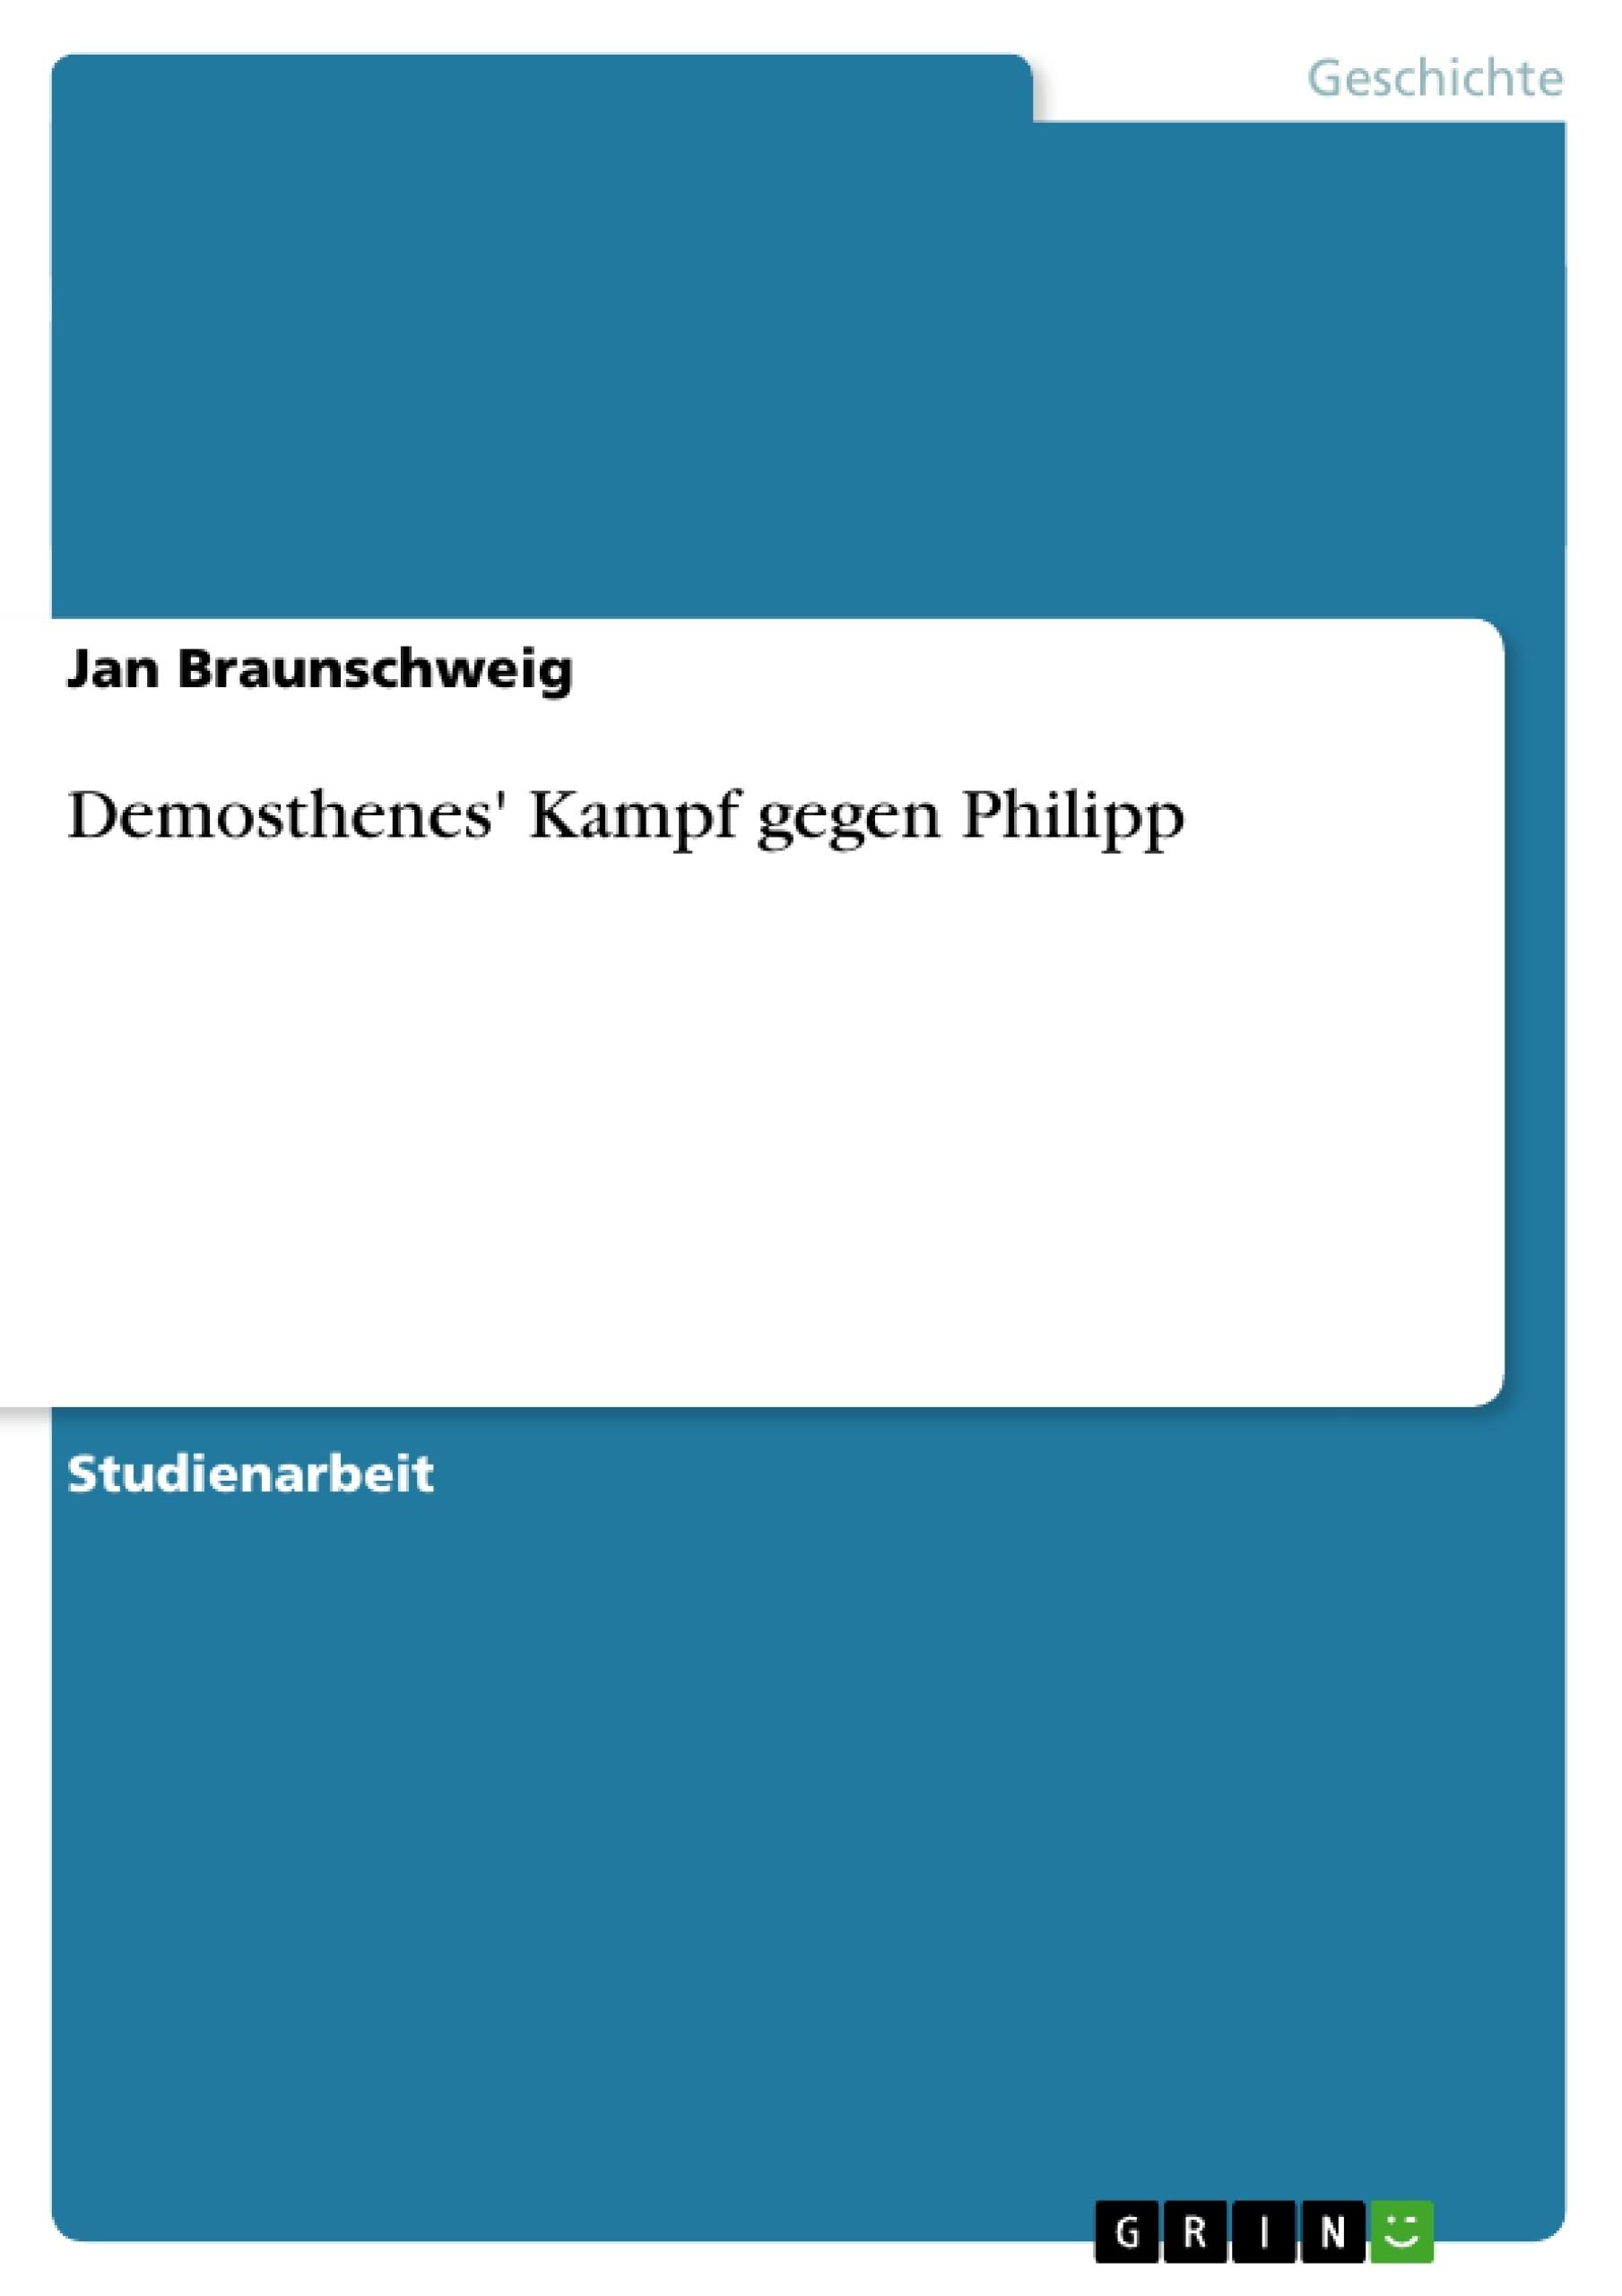 Titel: Demosthenes' Kampf gegen Philipp